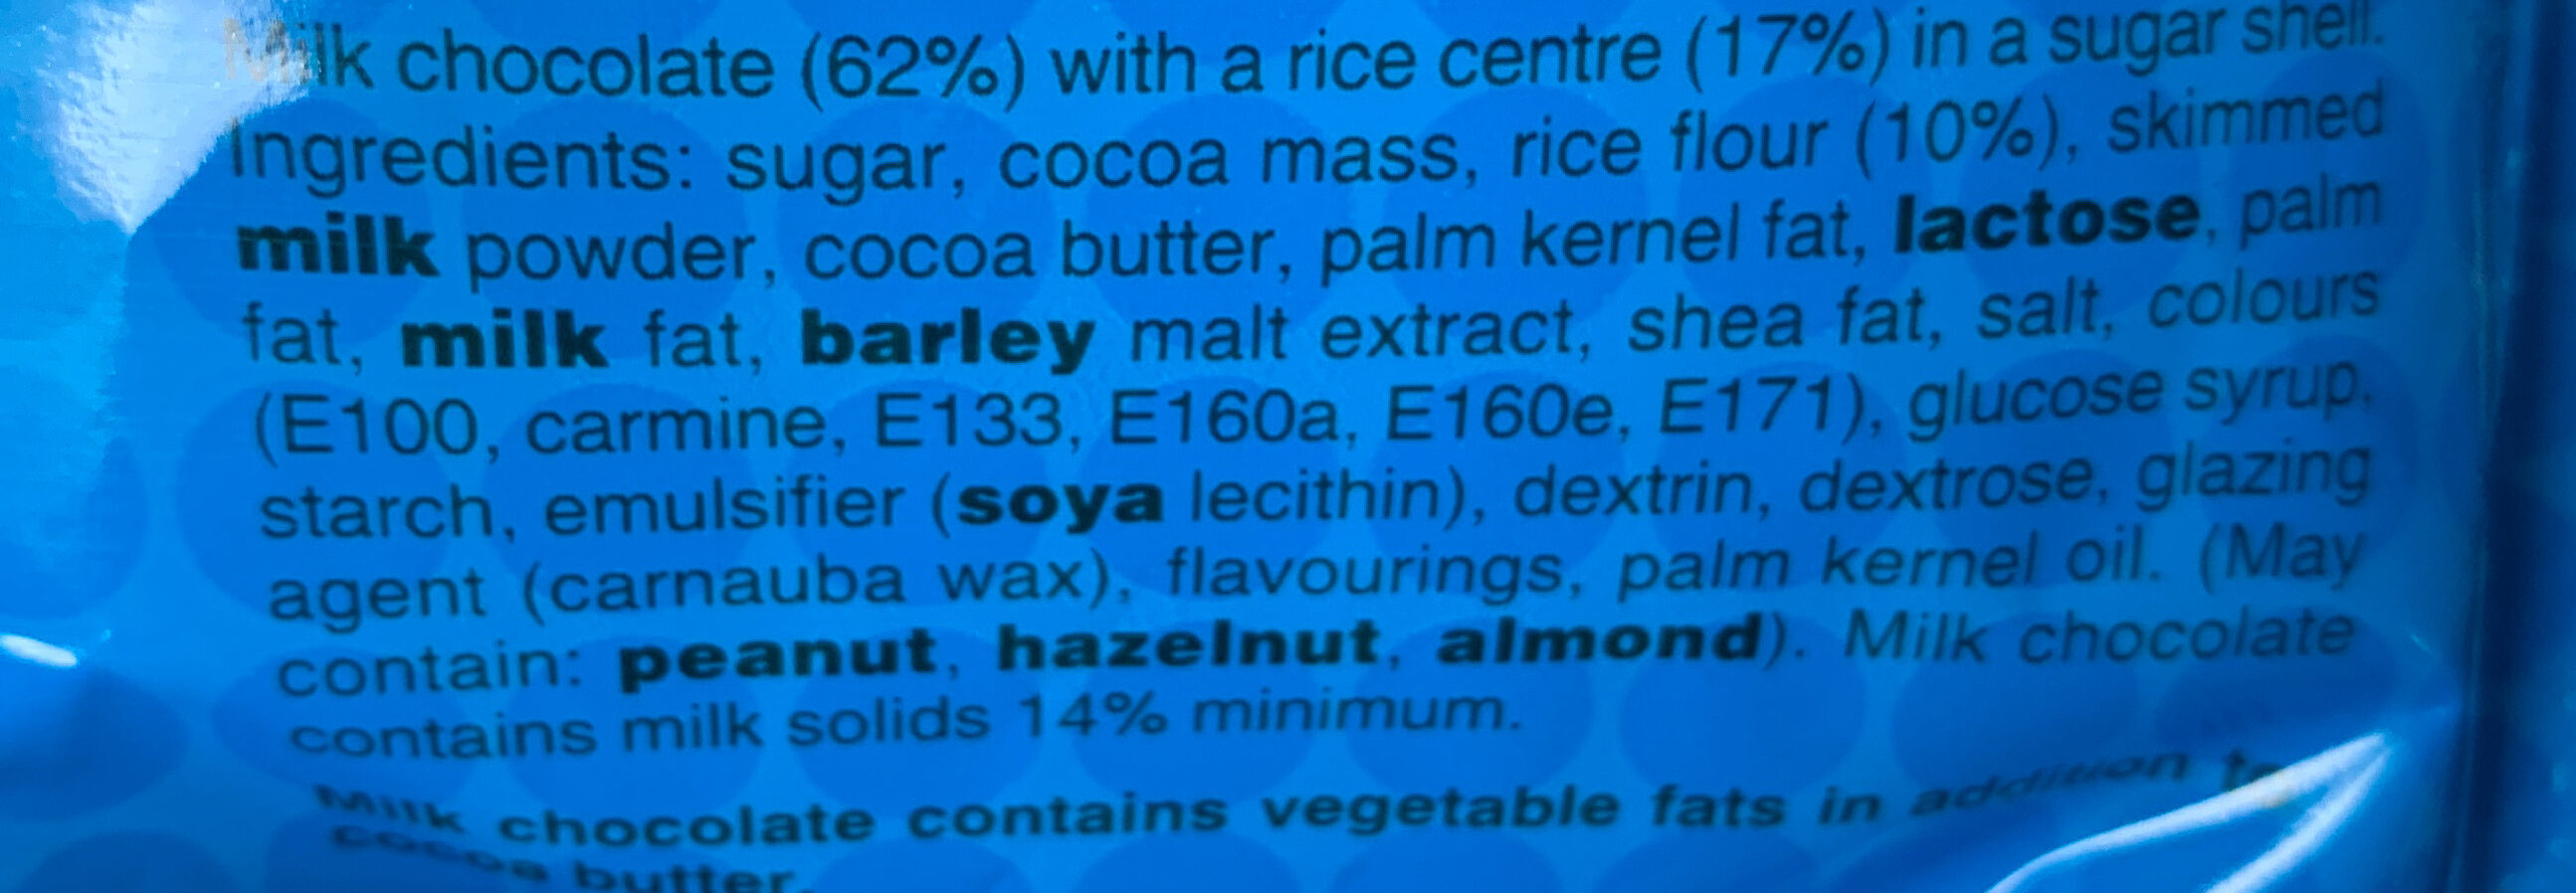 M&S Crispy - Ingredients